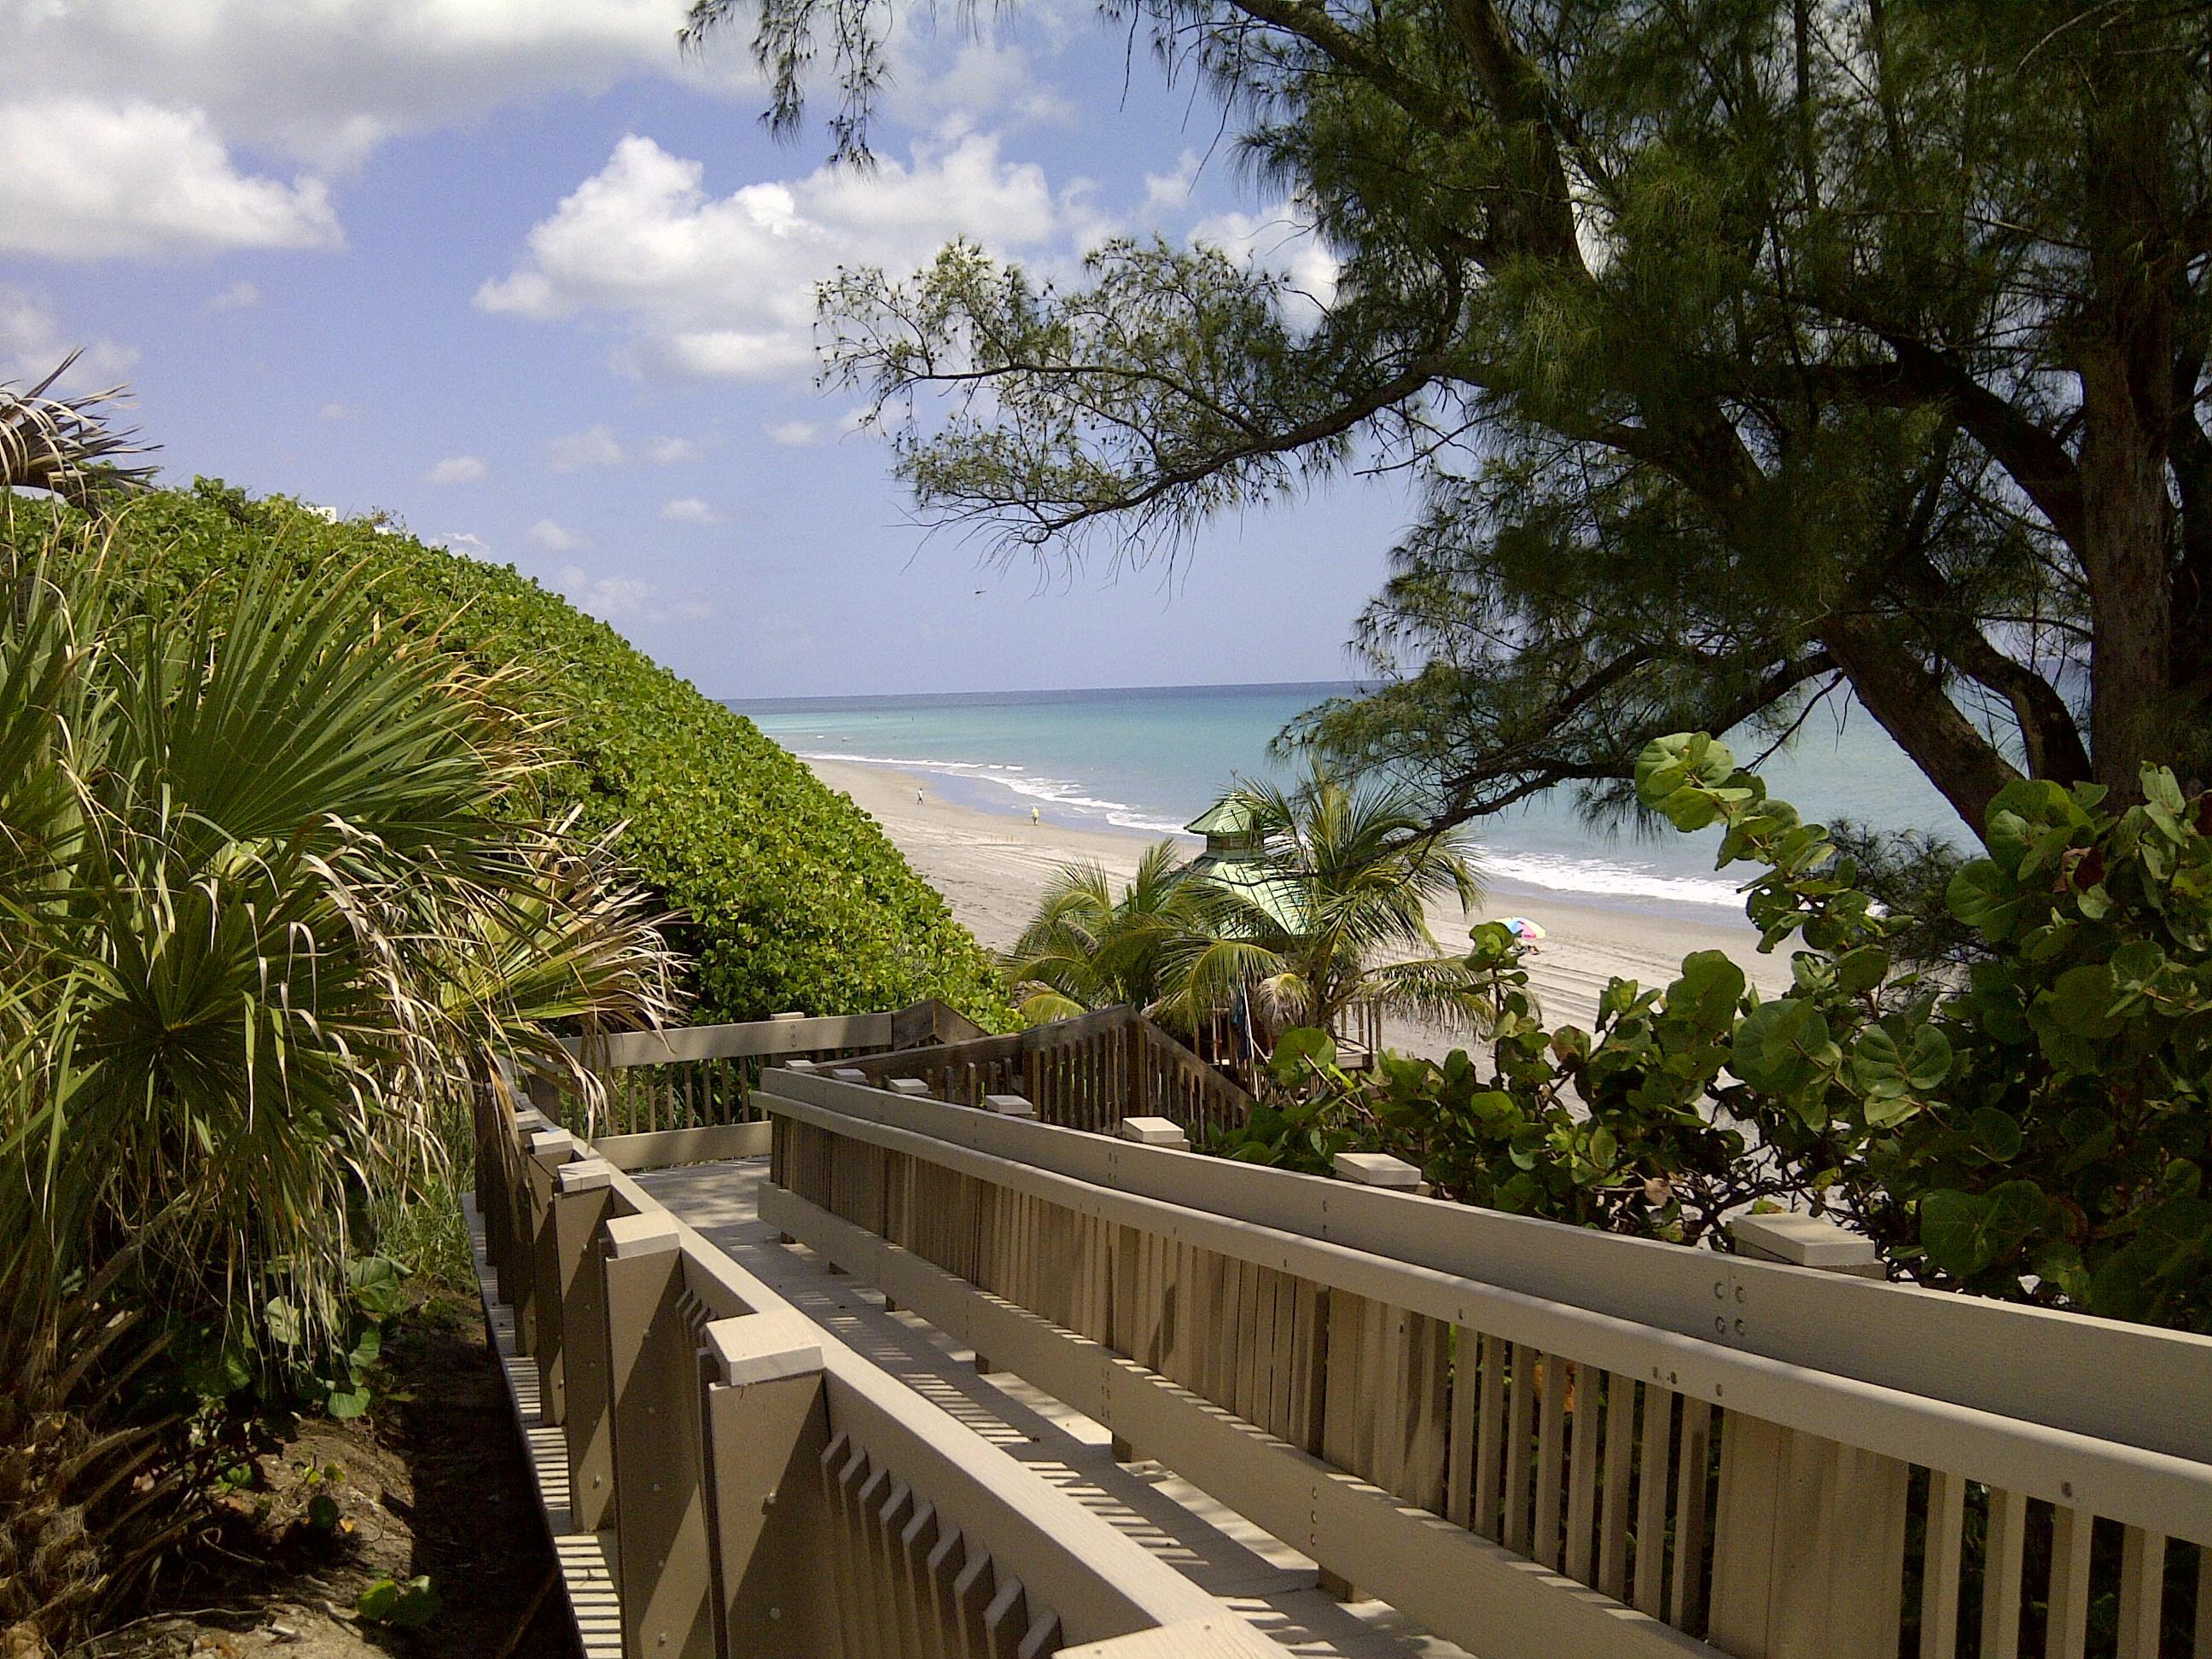 1111 S Ocean Boulevard #220 Boca Raton, FL 33432